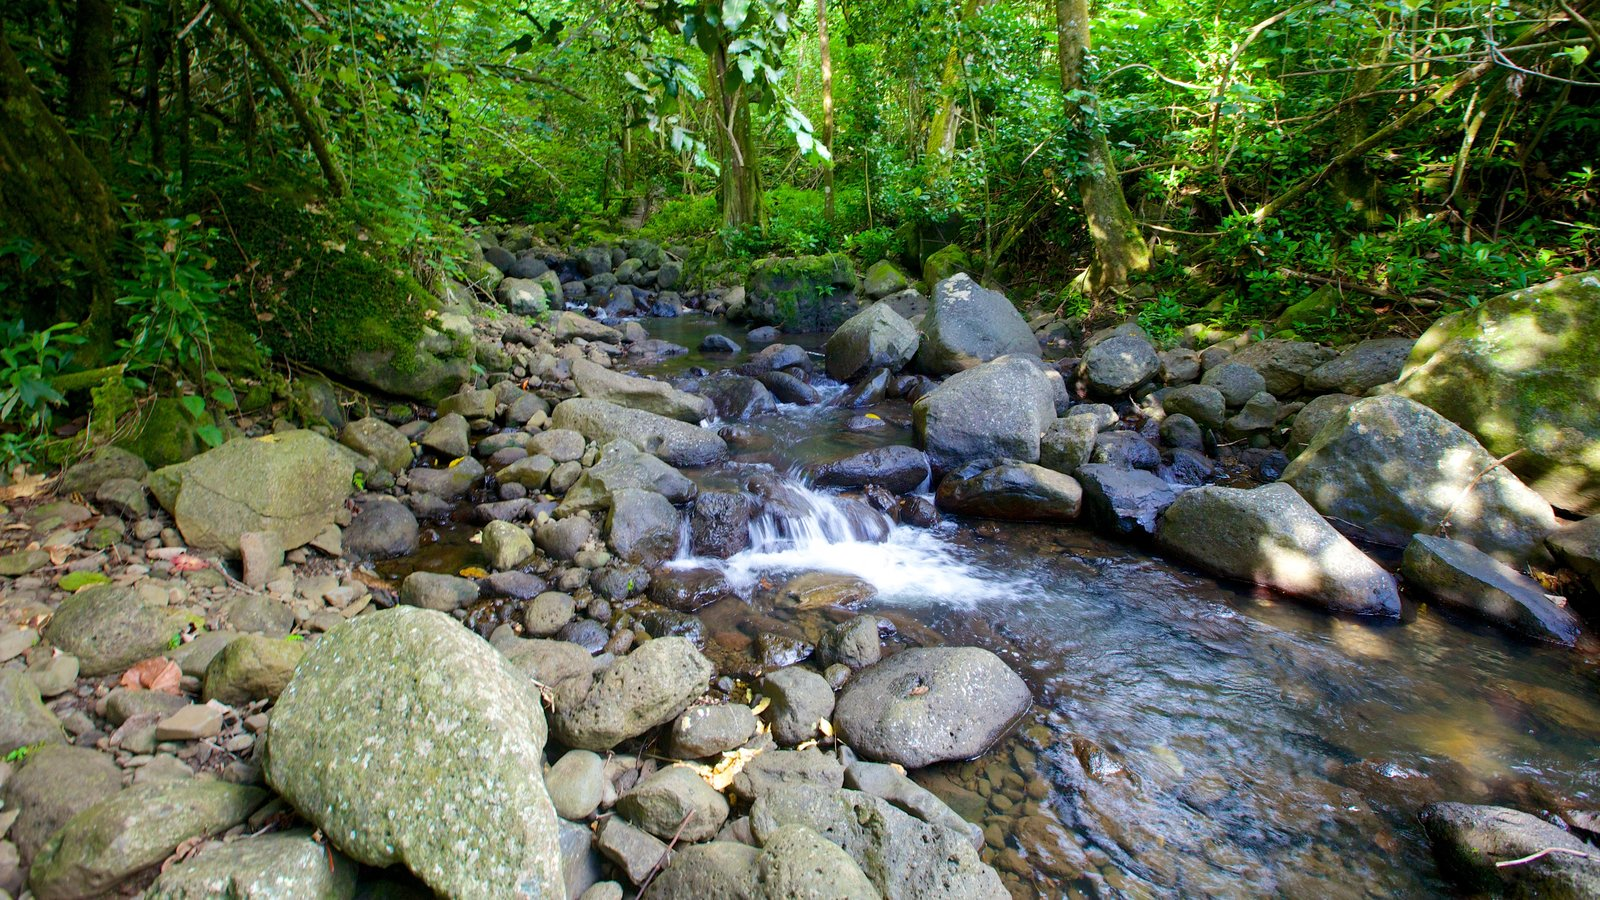 Raiatea which includes a river or creek and rainforest